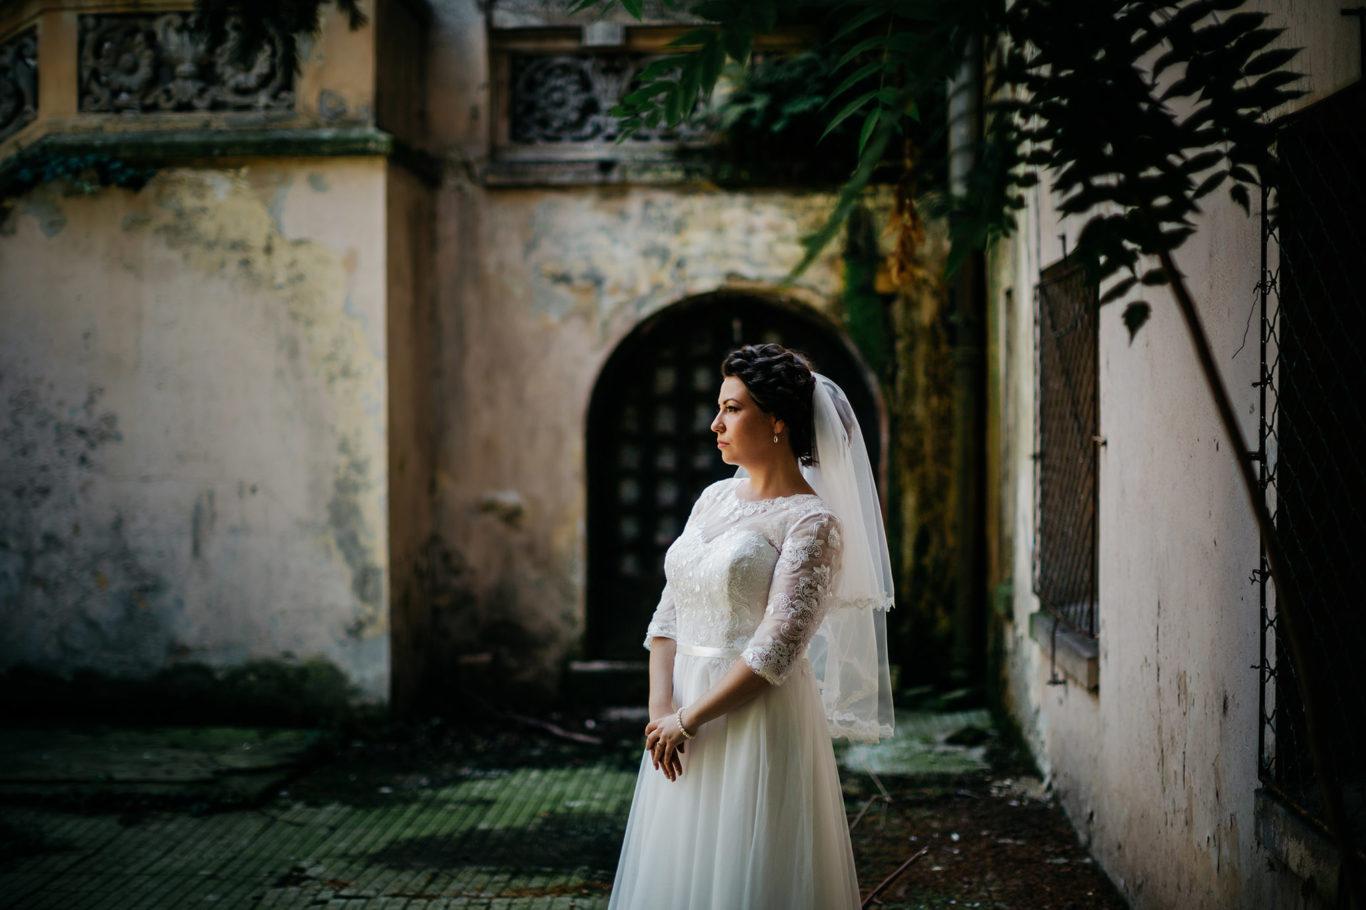 0336-fotografie-nunta-bucuresti-anca-george-fotograf-ciprian-dumitrescu-dcf_4725